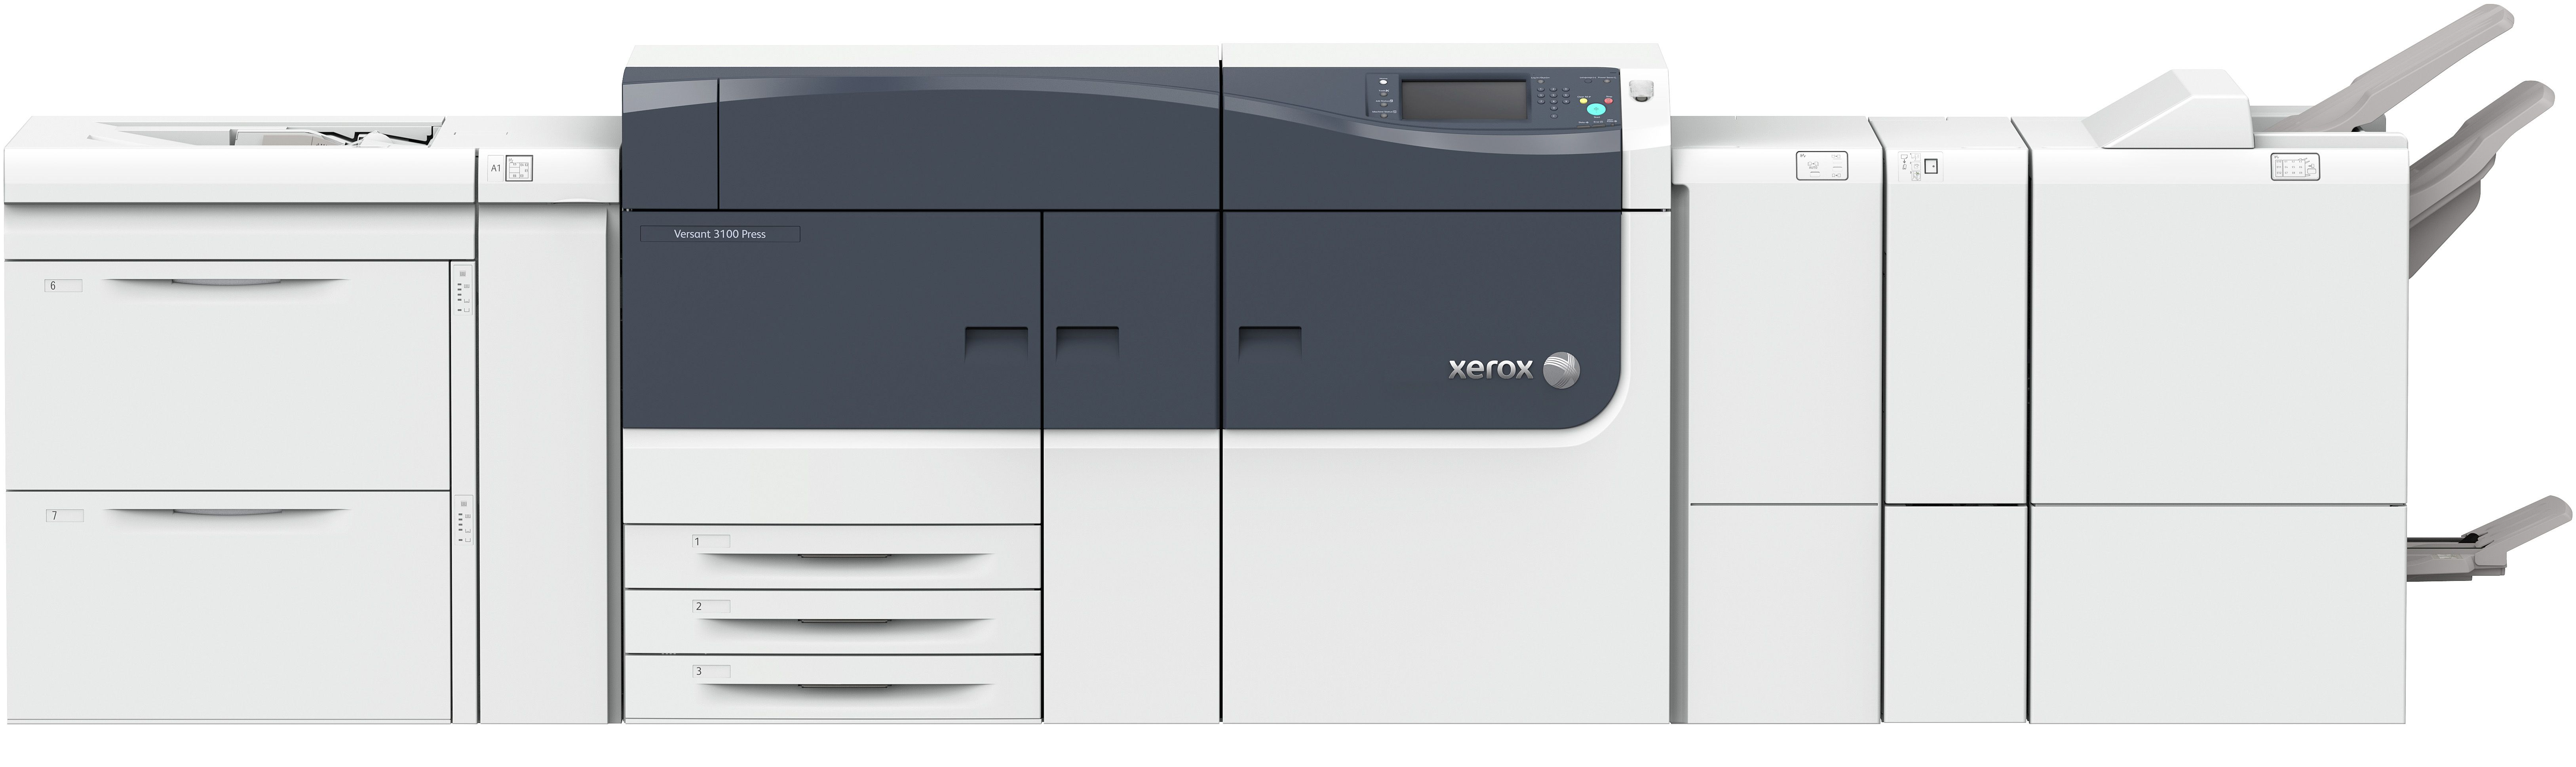 Xerox Versant 3100 Press Office Prints Locker Storage Banner